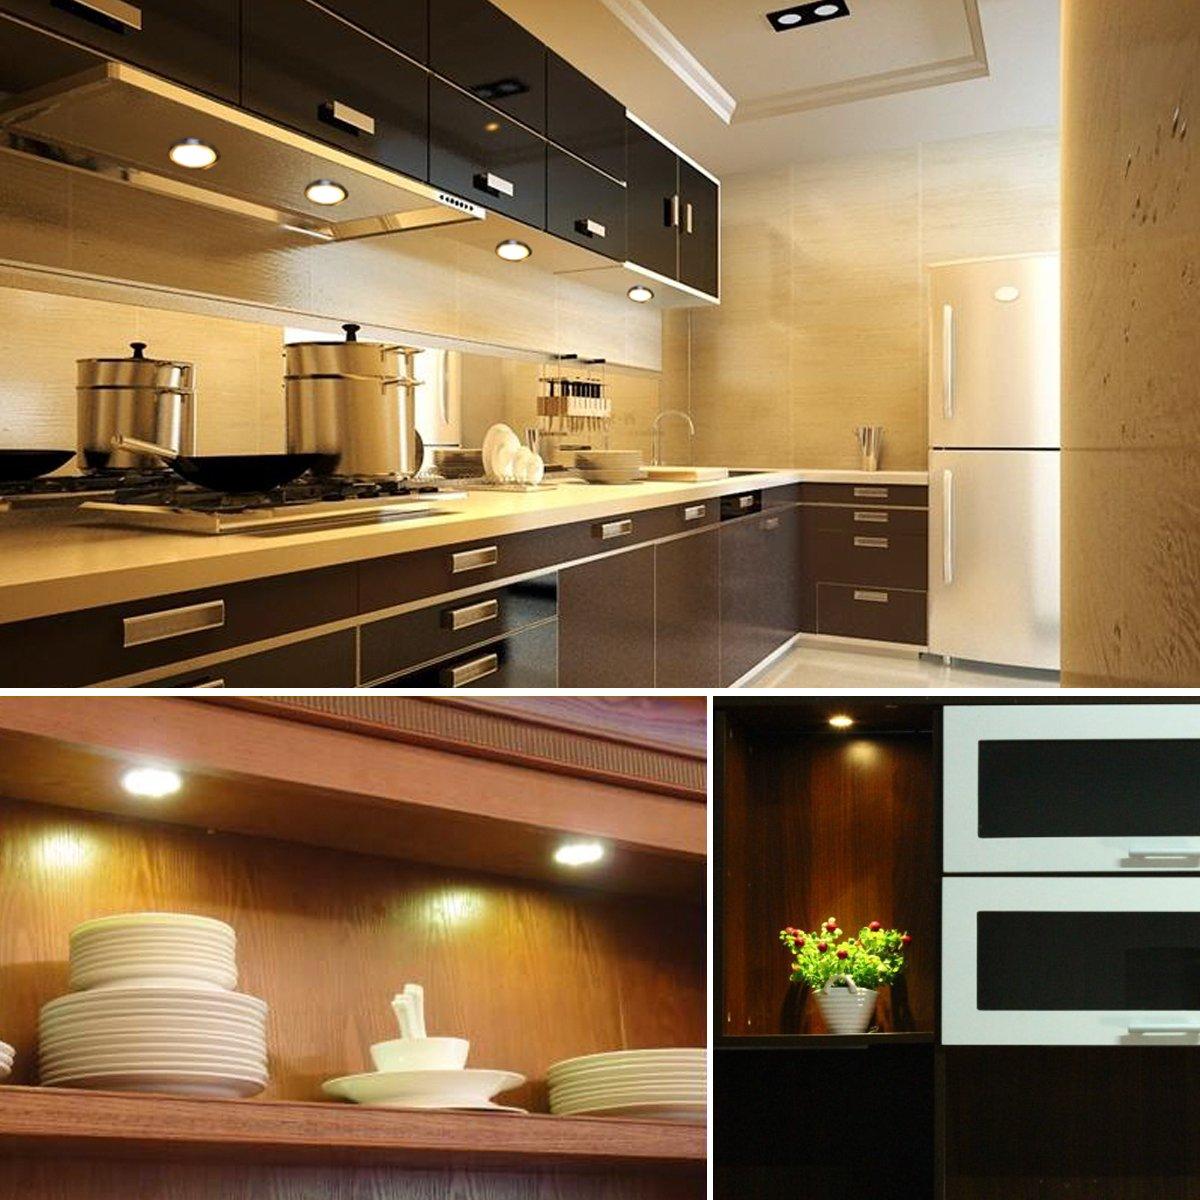 Amazoncom TryLight LED Under Cabinet Lighting Kit 1020lm 3000K